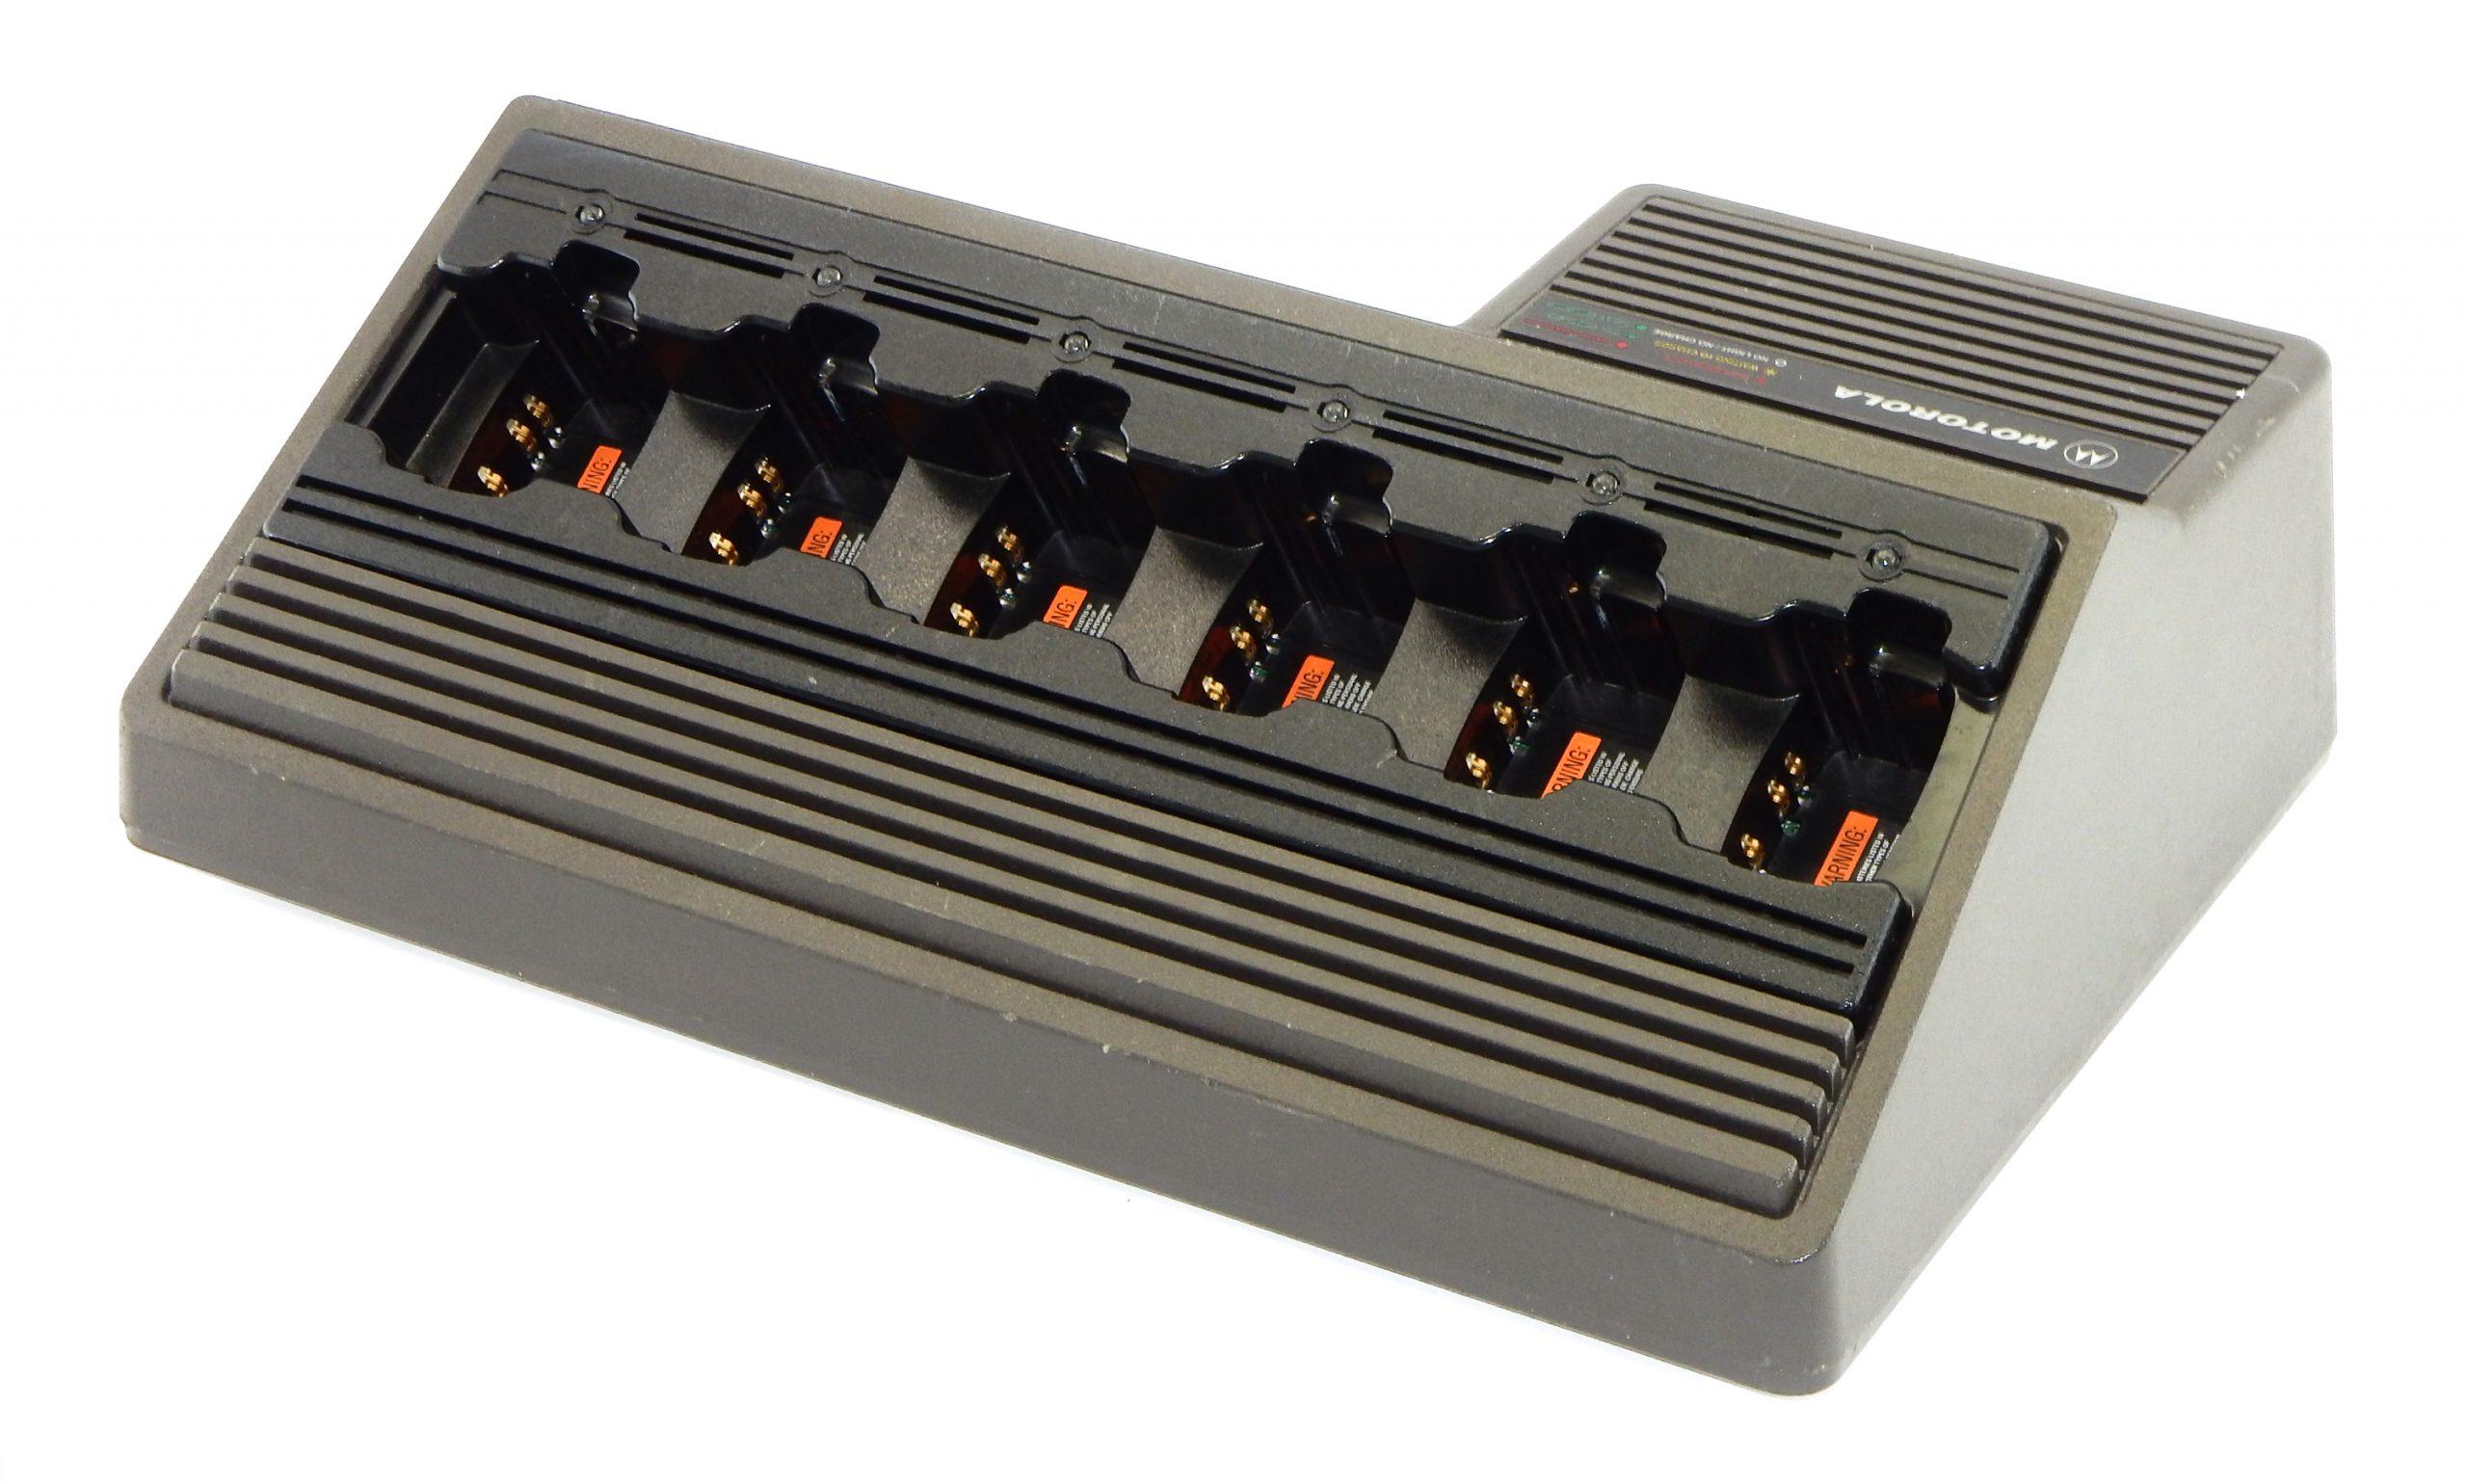 Motorola GP340 6 Way Charger Image